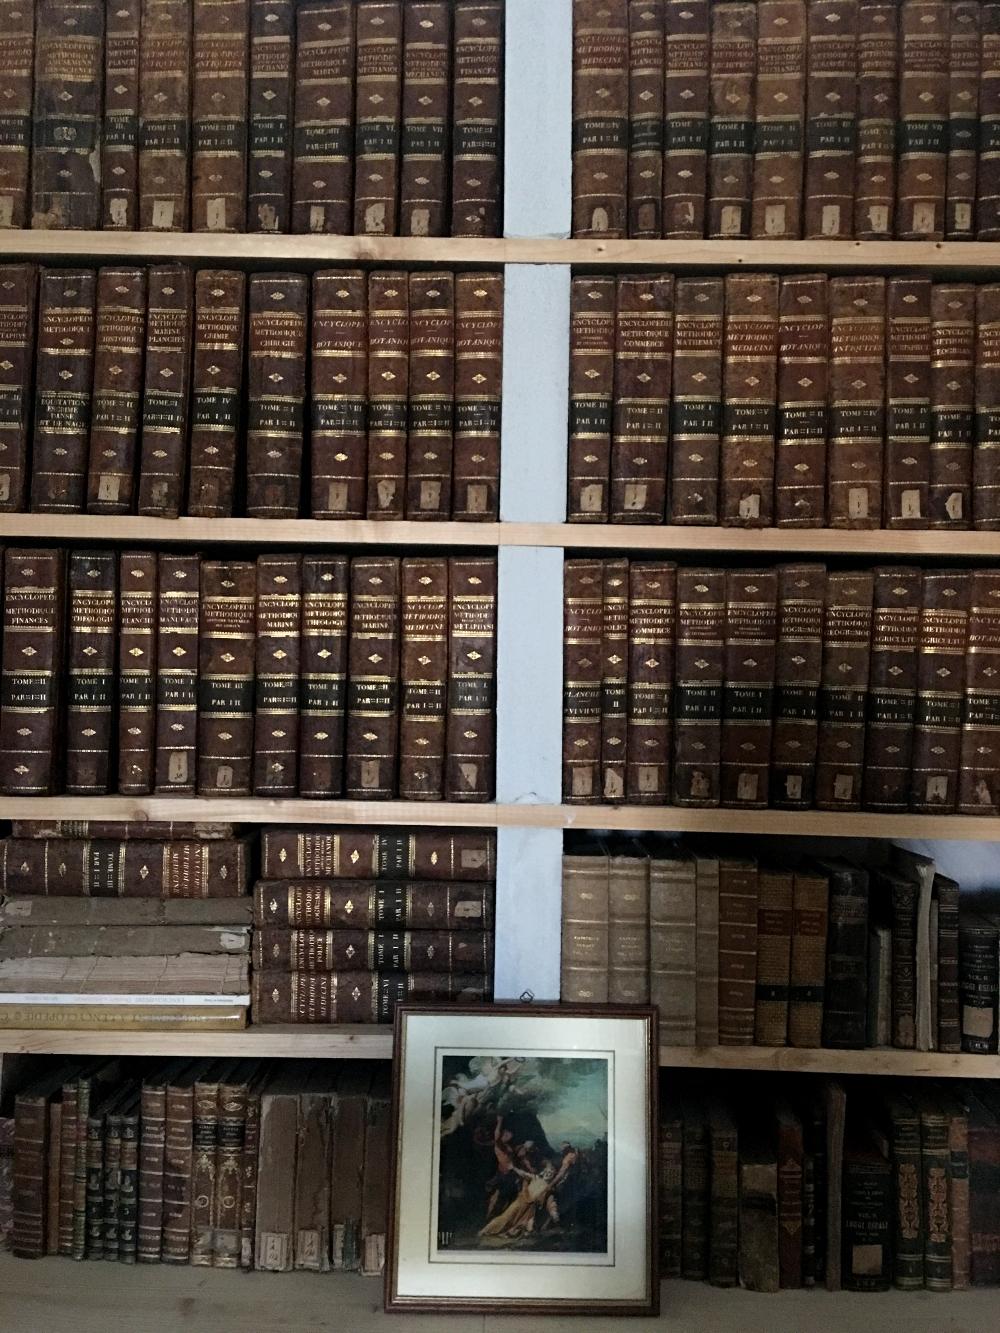 Villa-Valguarnera-biblioteca-Baghera-Sicilia-rocaille-blog-5